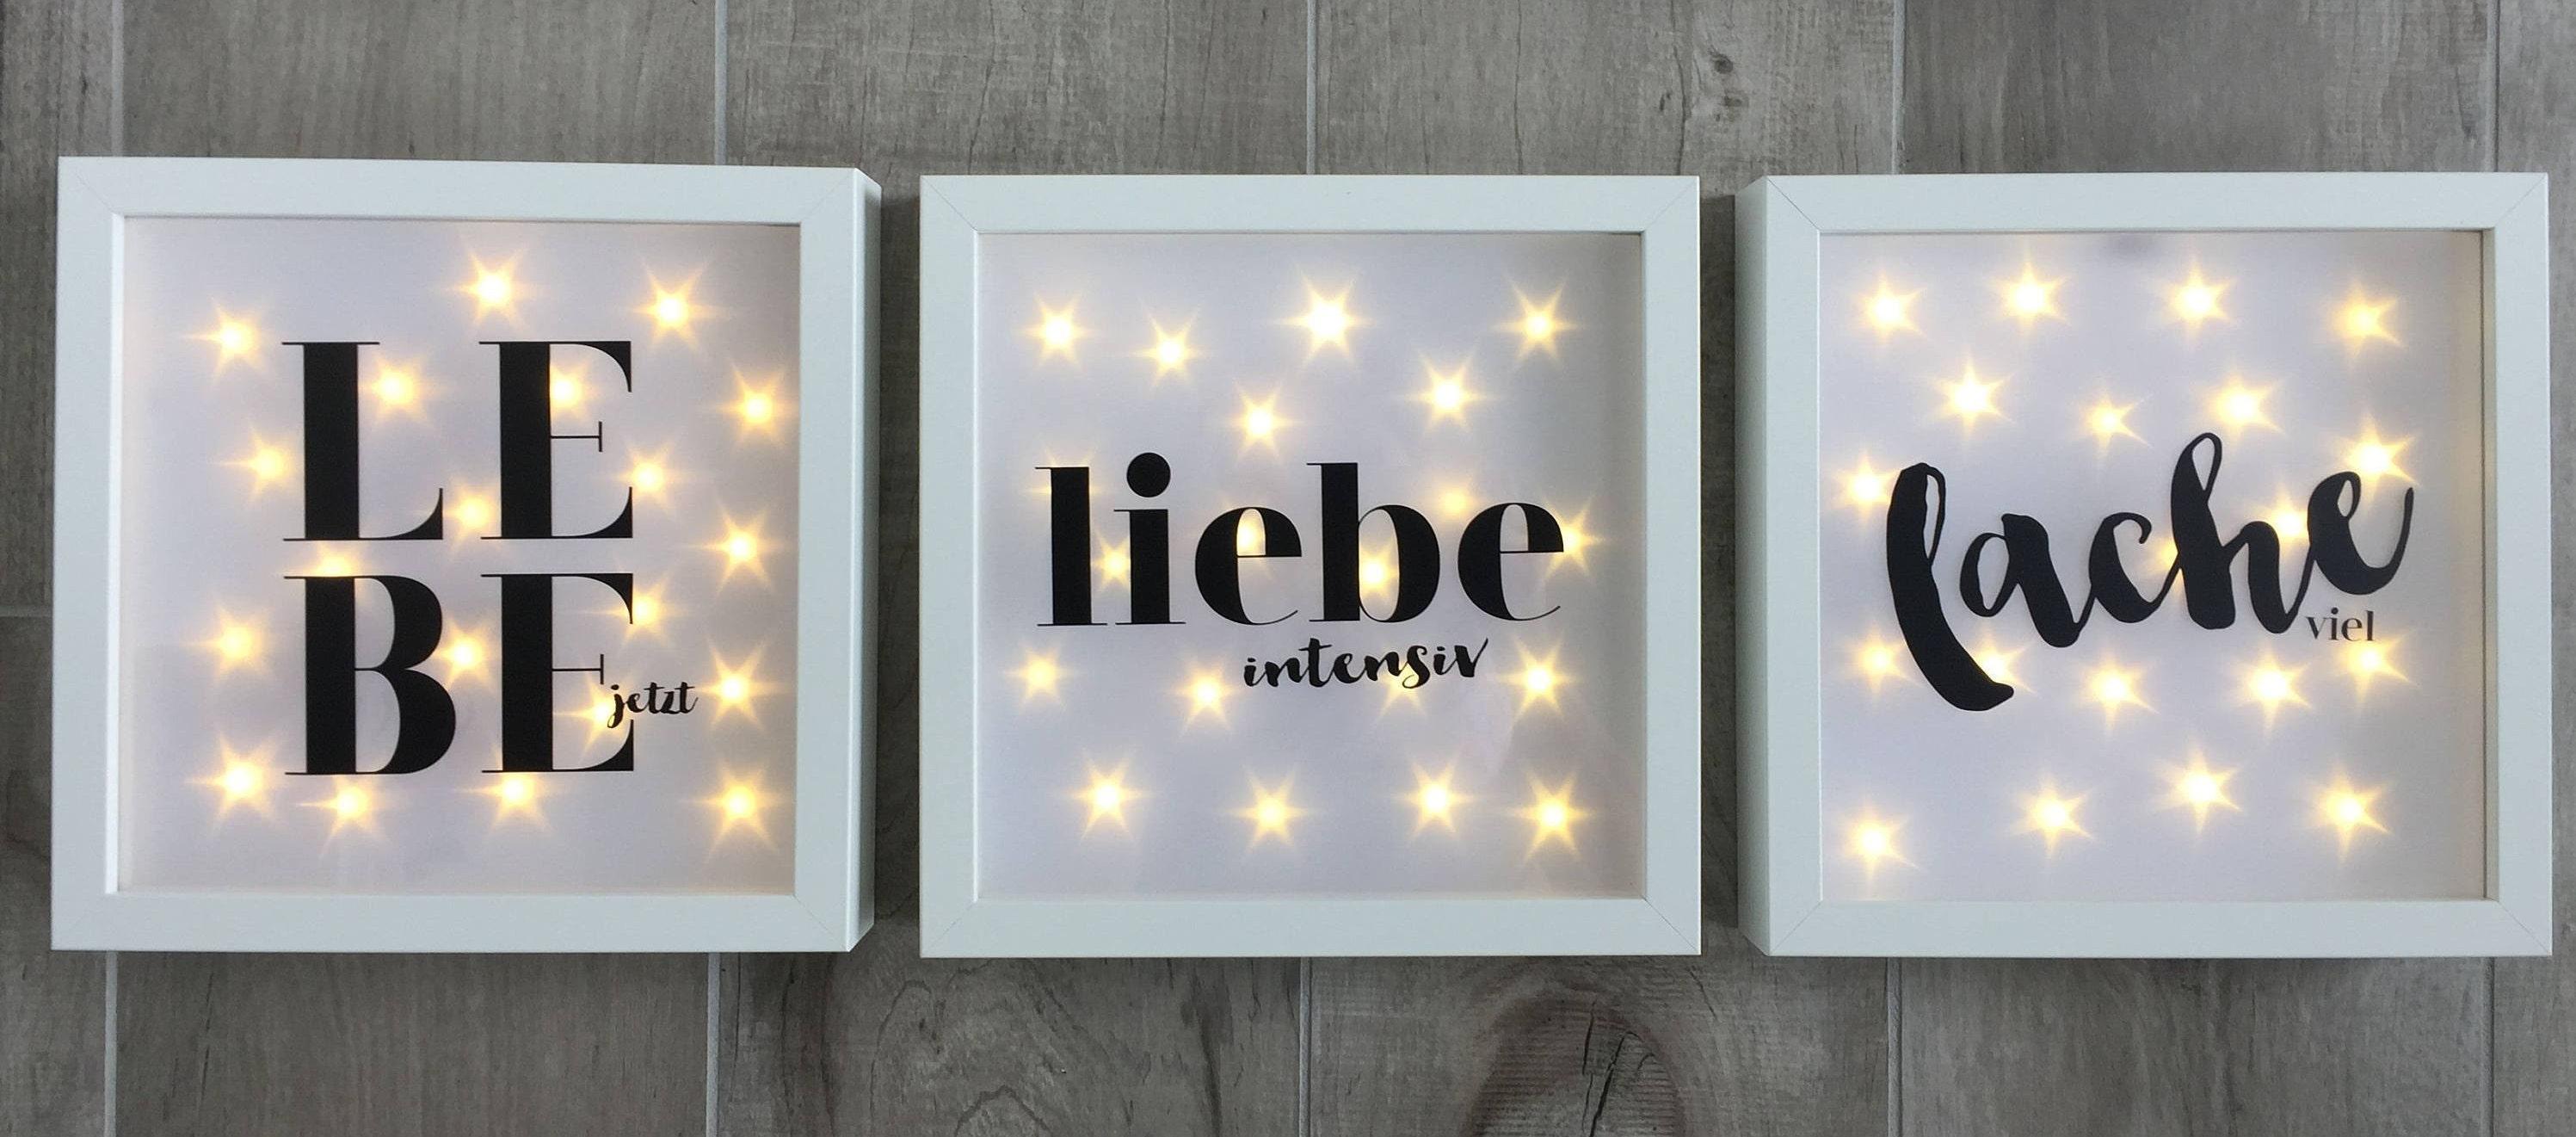 Gemütlich Beste Freunde Fotorahmen Galerie - Rahmen Ideen ...